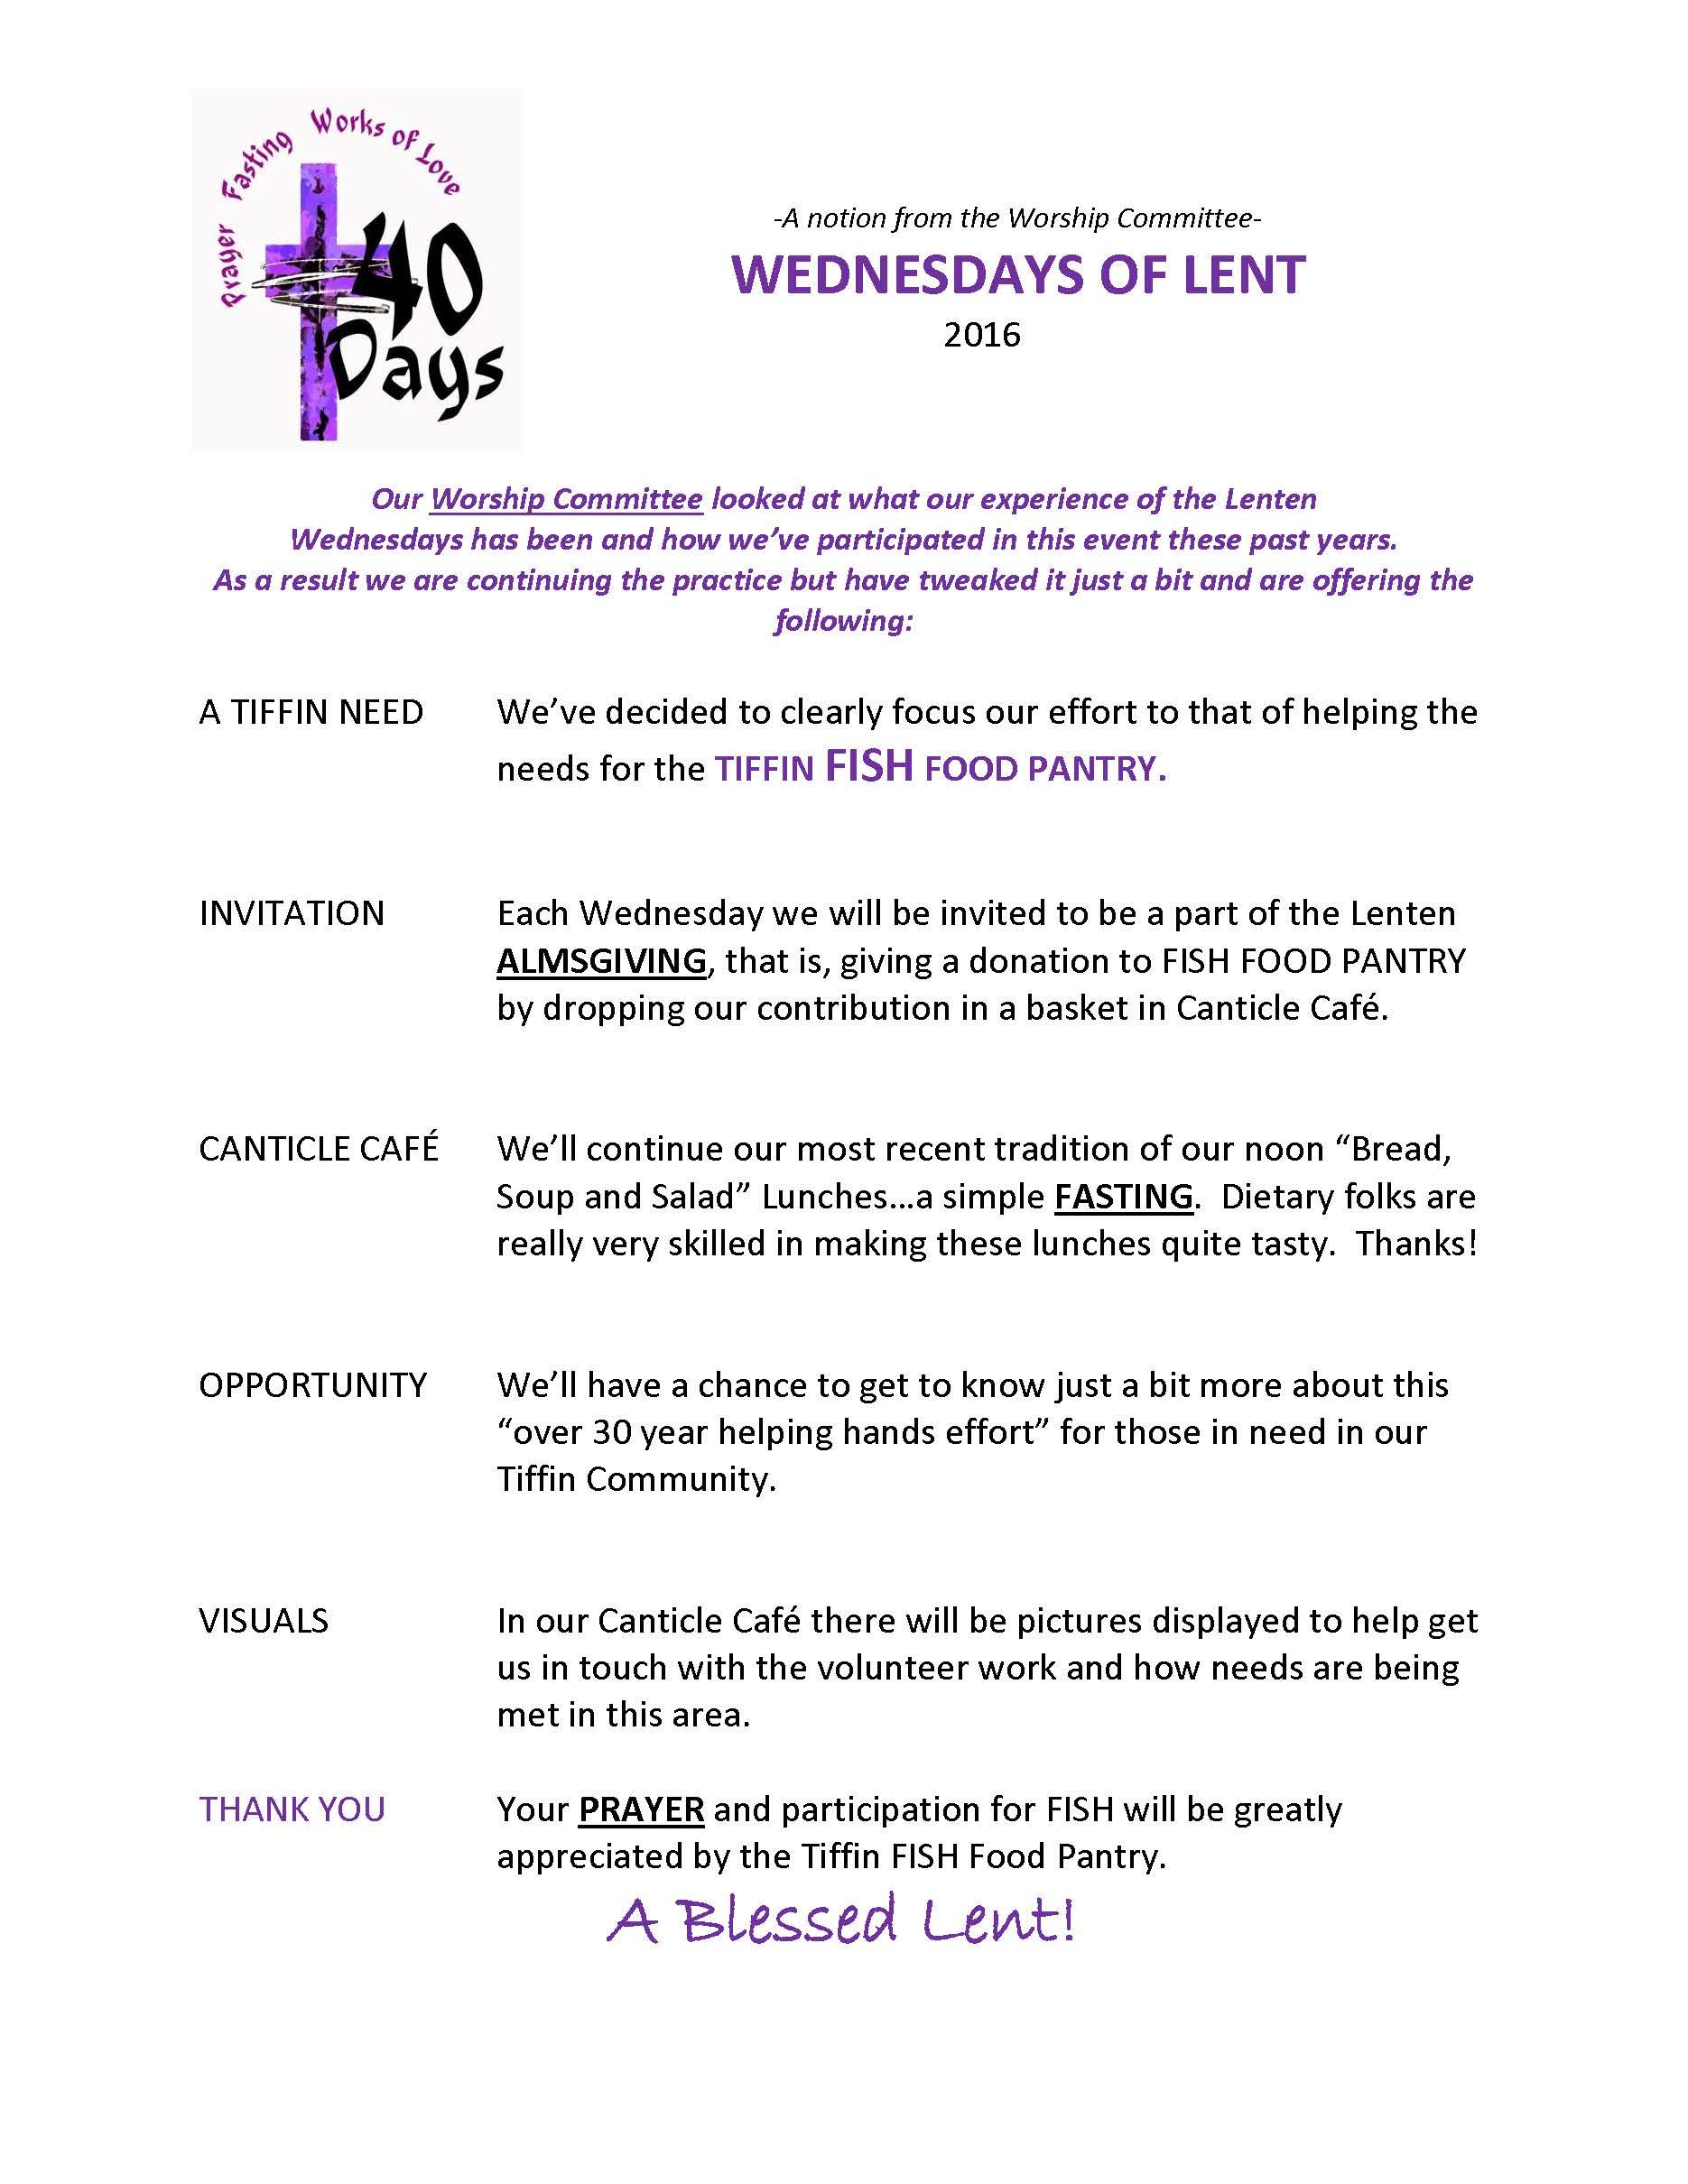 Wednesdays of Lent